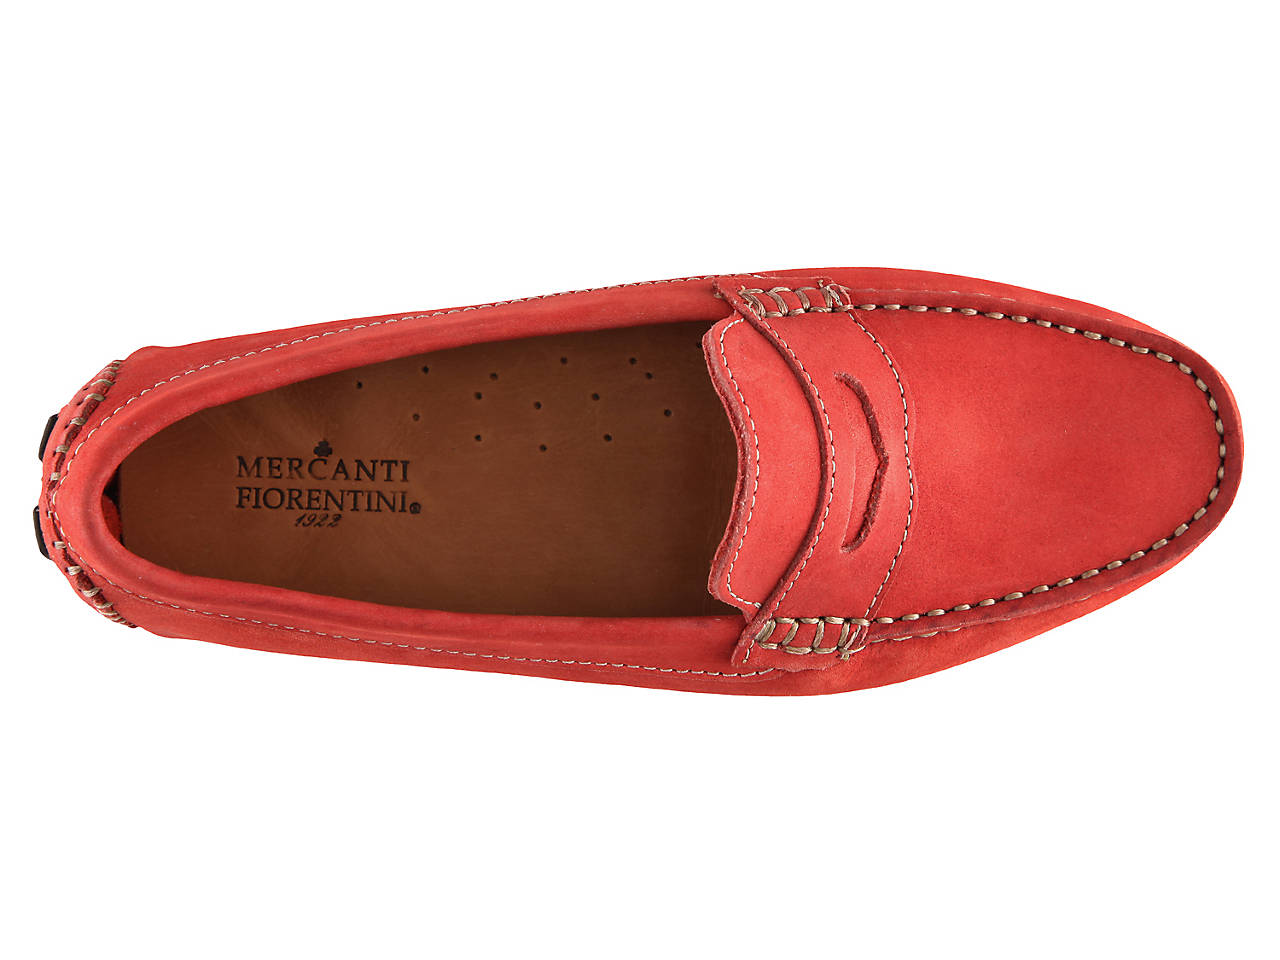 5fc5d56b6b1 Mercanti Fiorentini Nubuck Penny Loafer Women s Shoes